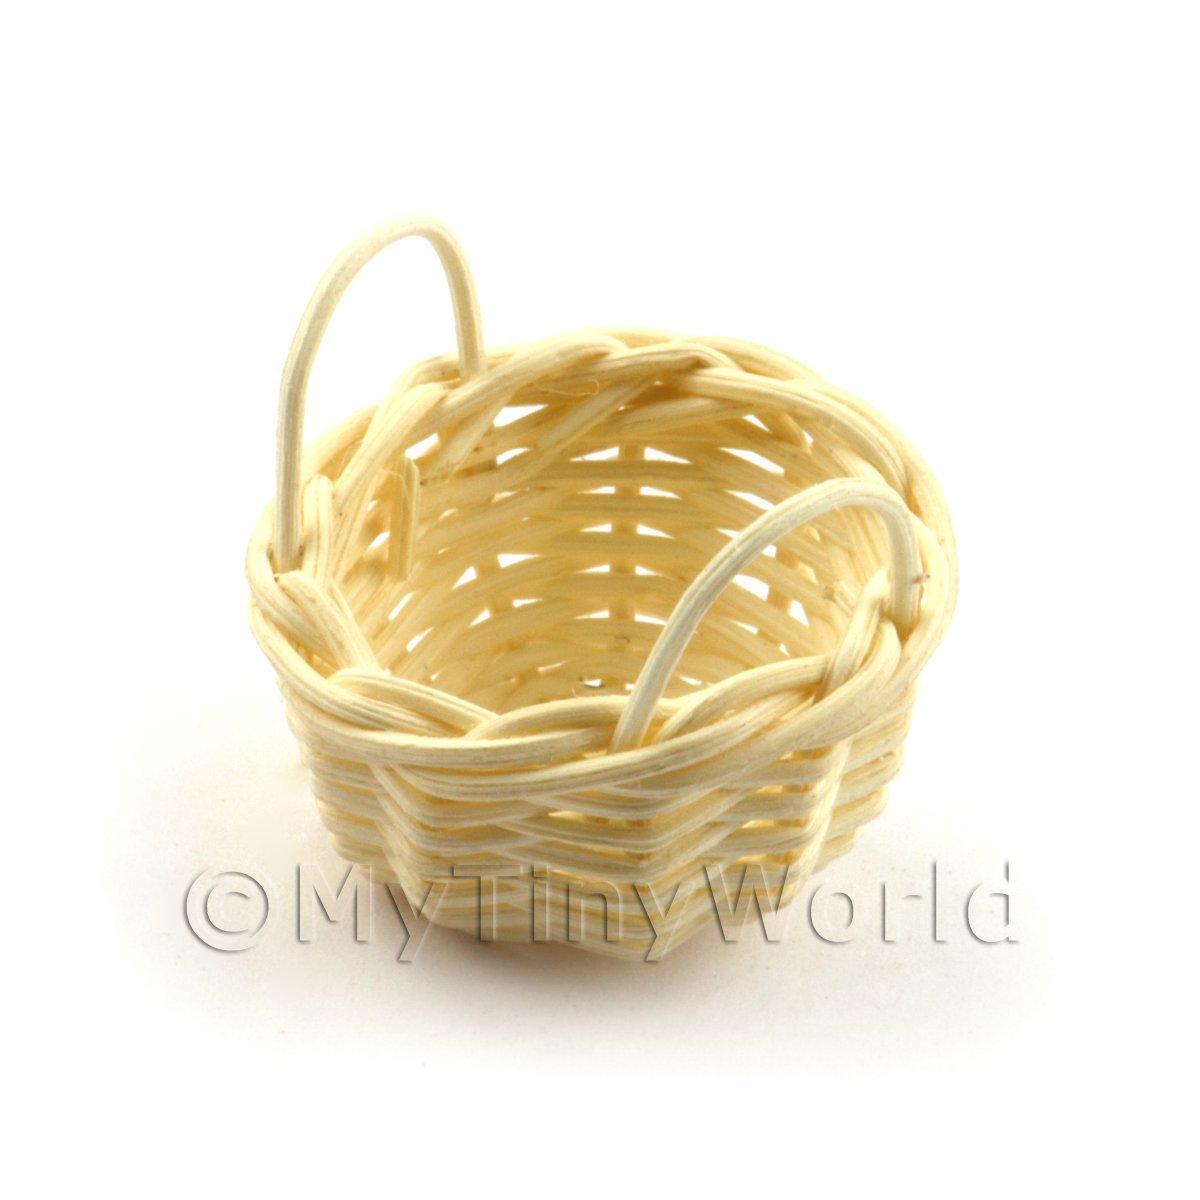 wicker baskets dolls house miniature mytinyworld. Black Bedroom Furniture Sets. Home Design Ideas